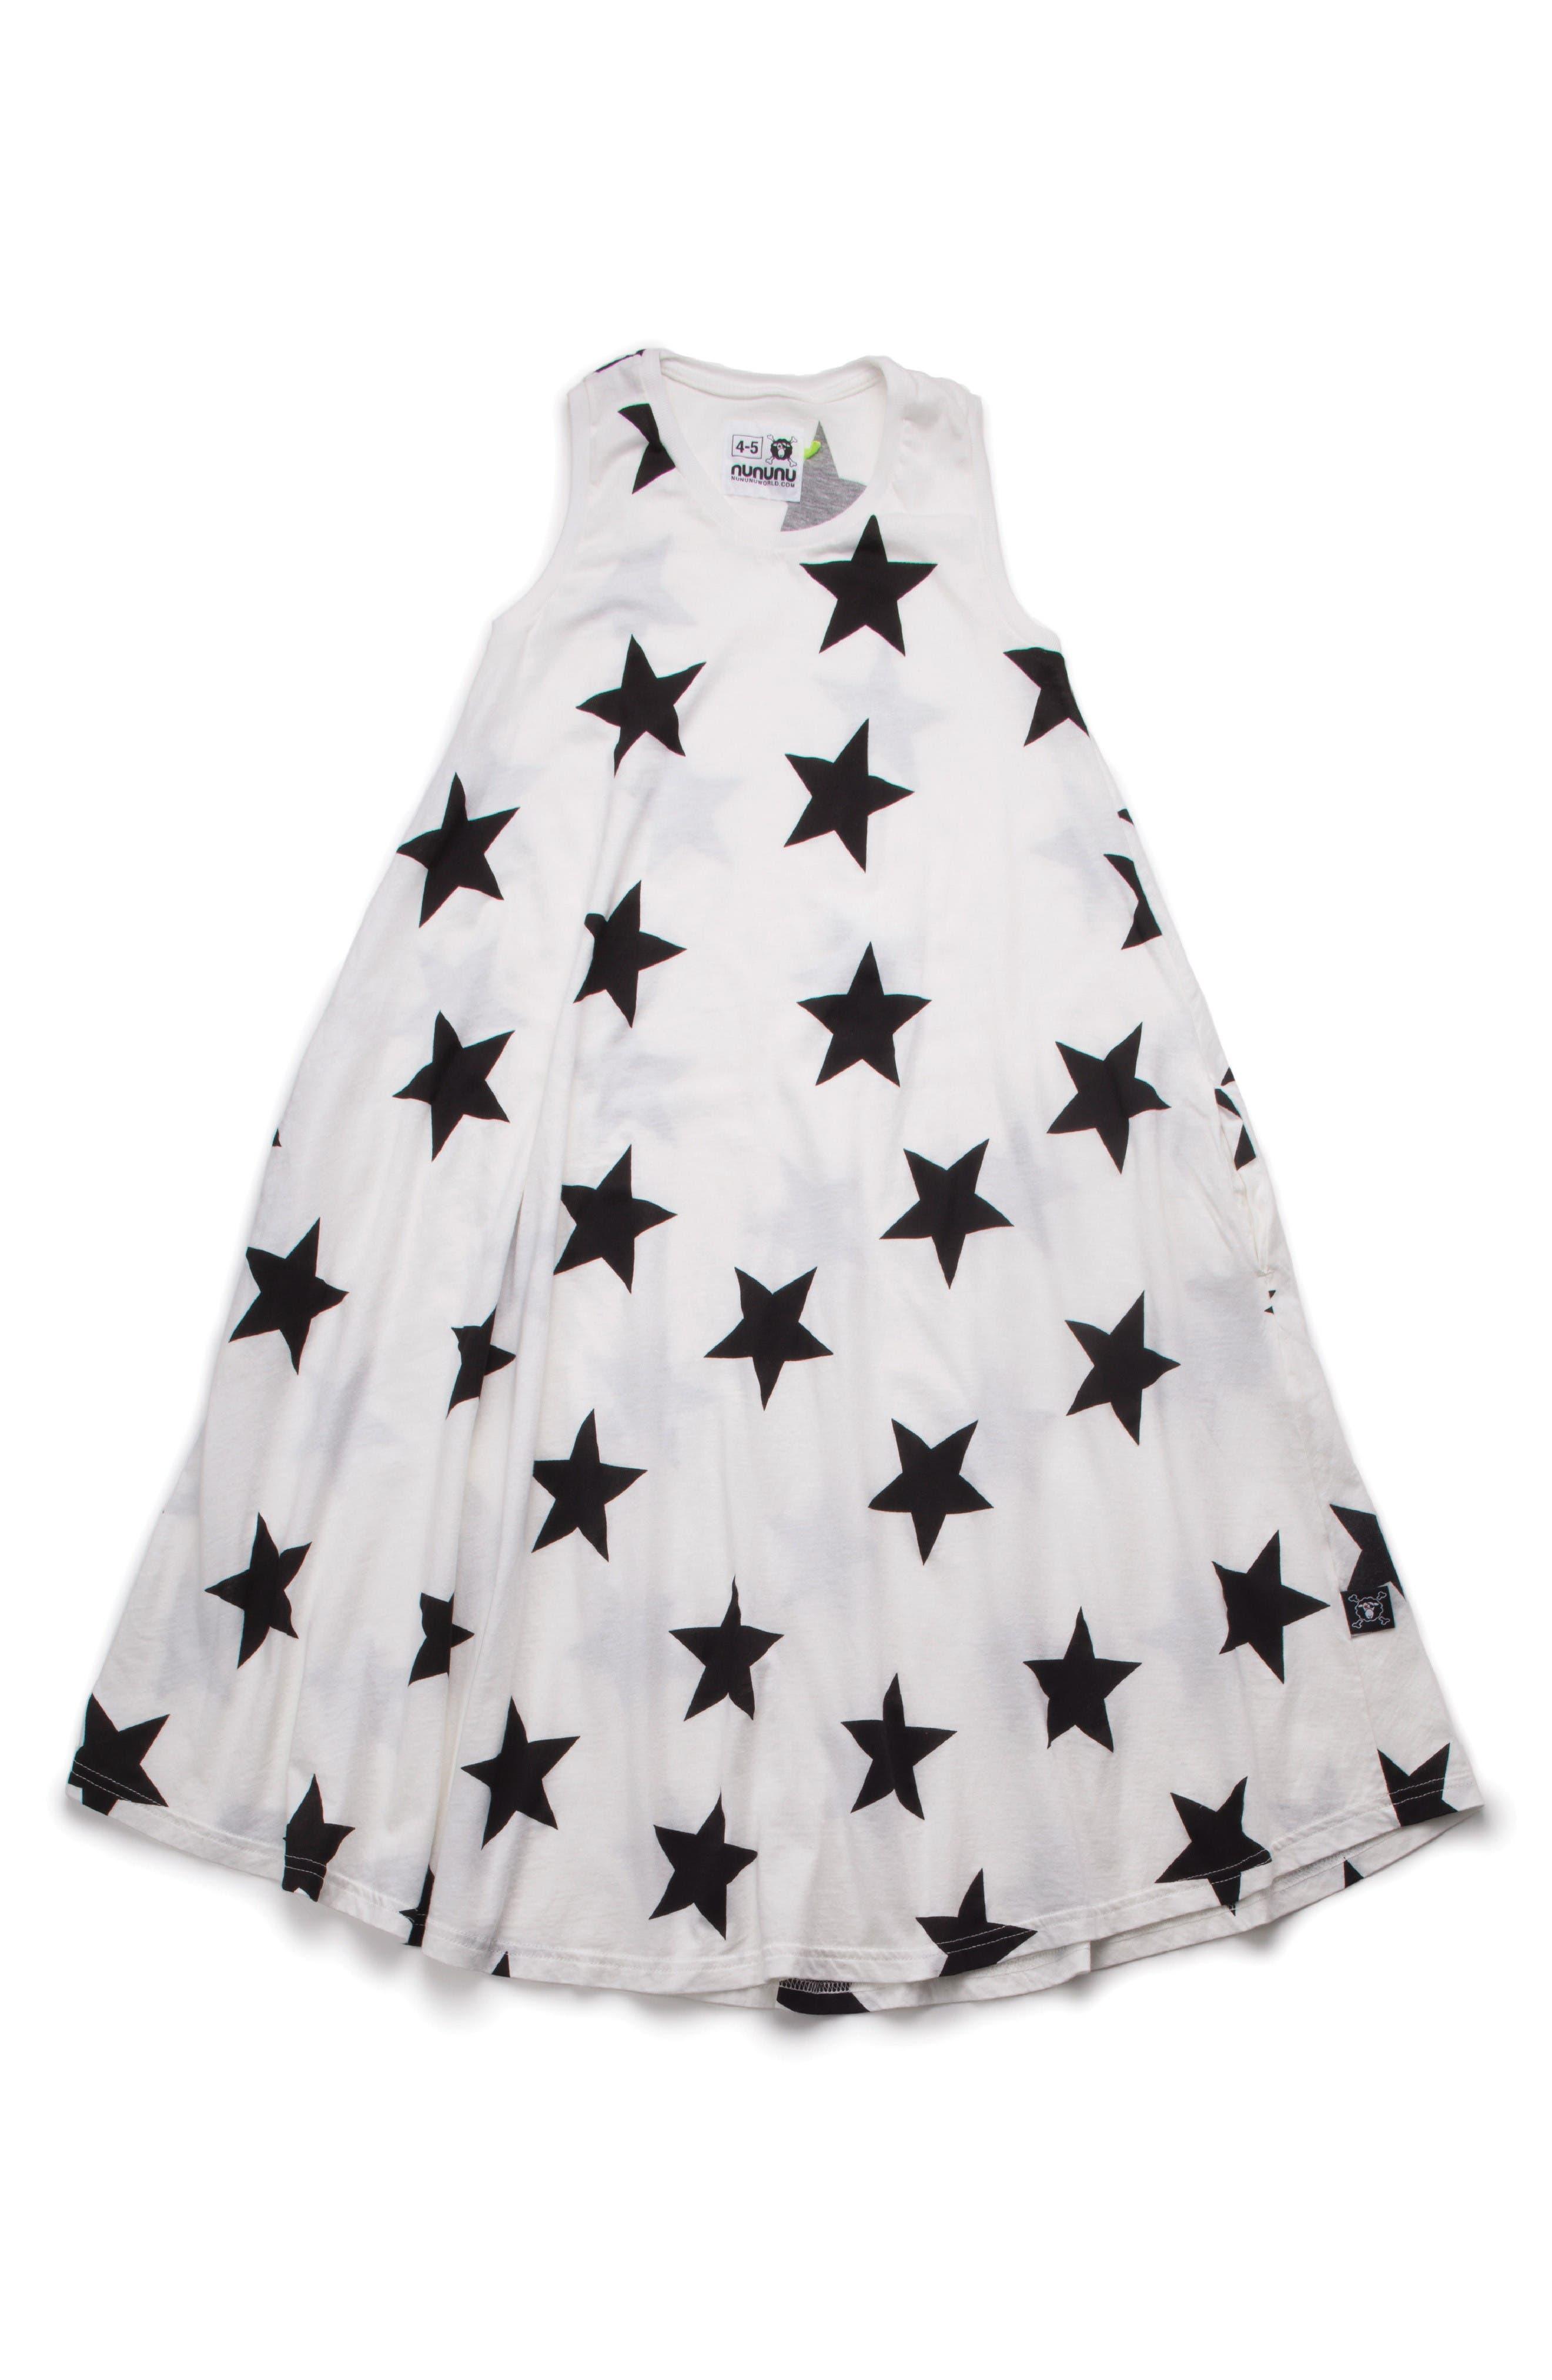 Main Image - NUNUNU Star Trapeze Dress (Toddler Girls & Little Girls)